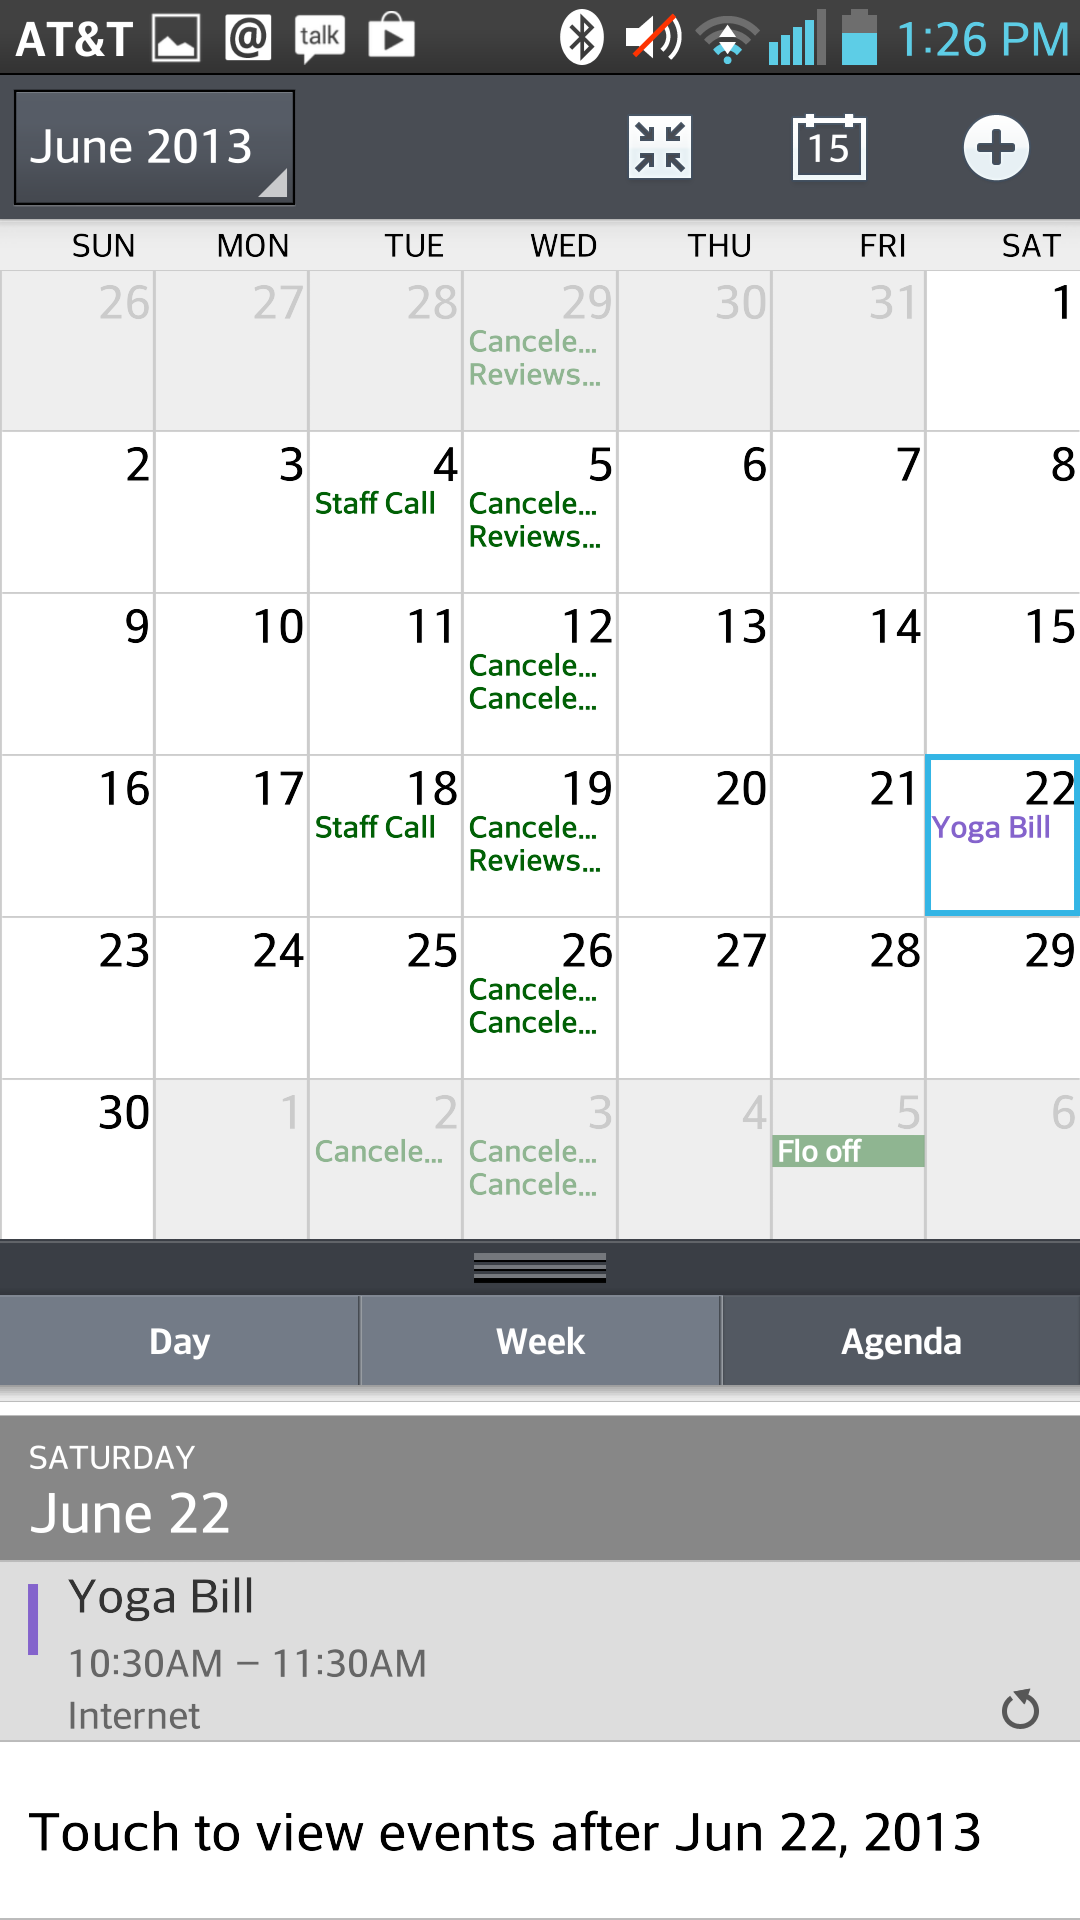 LG's calendar app.